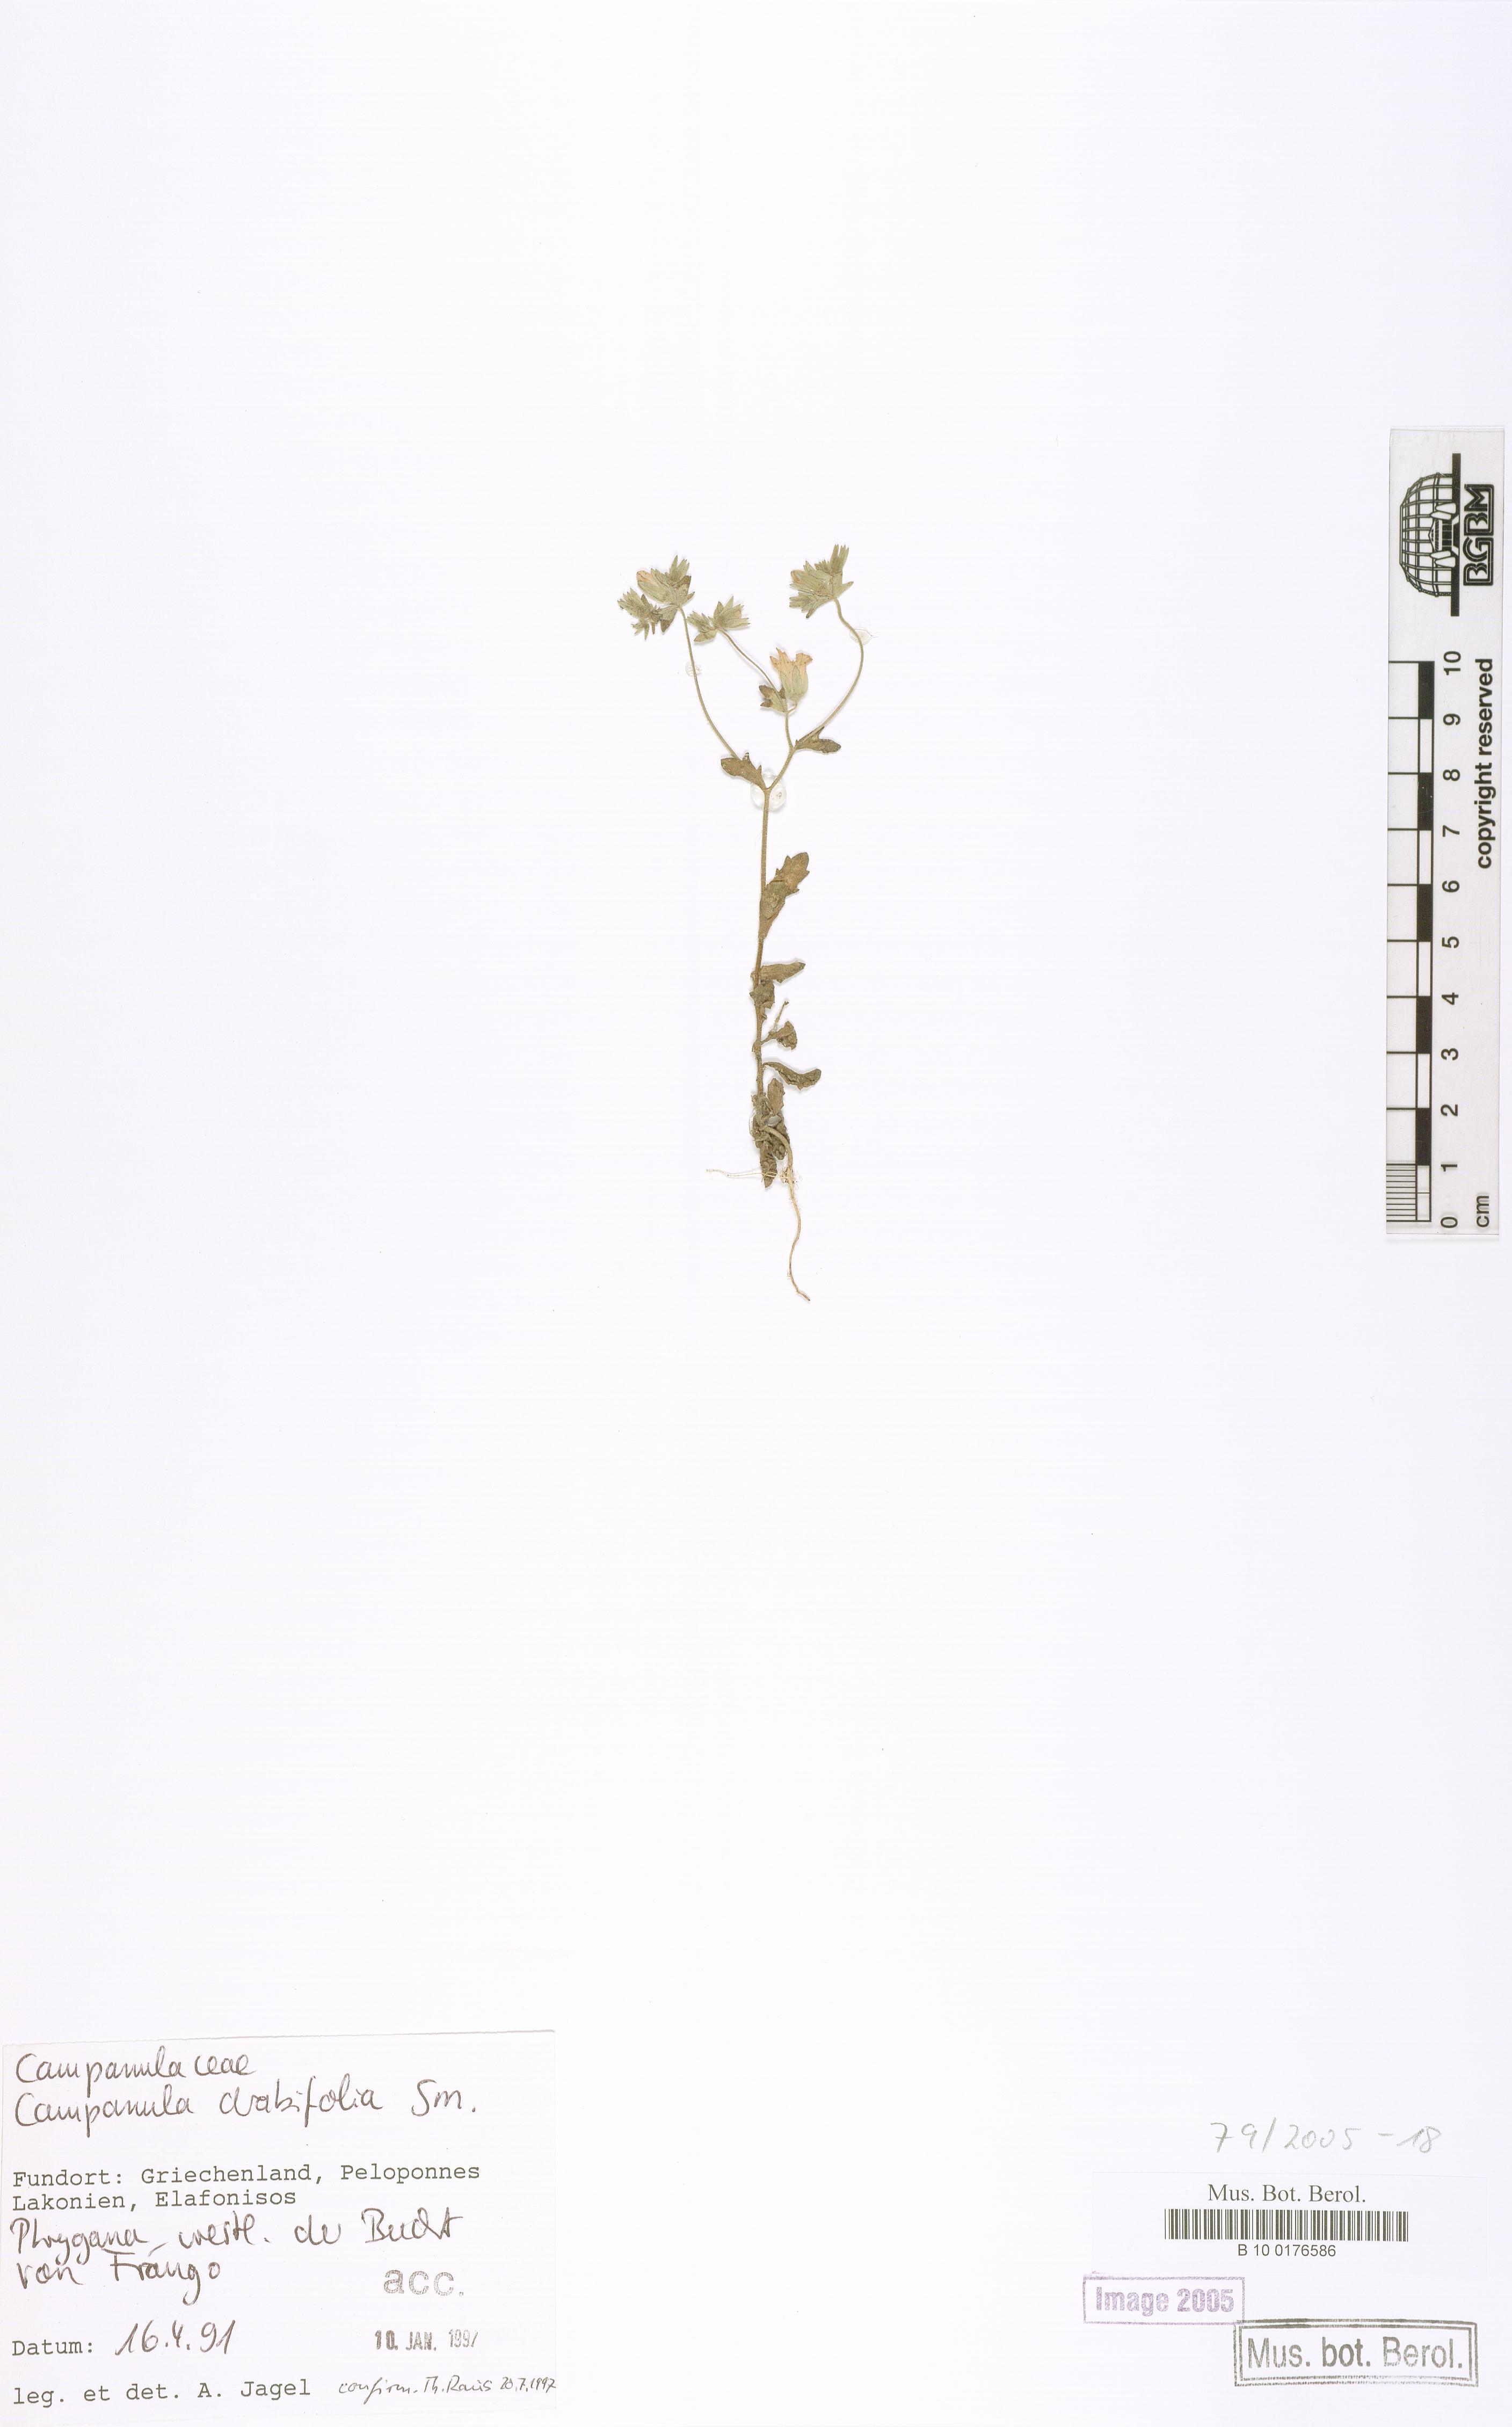 http://ww2.bgbm.org/herbarium/images/B/10/01/76/58/B_10_0176586.jpg